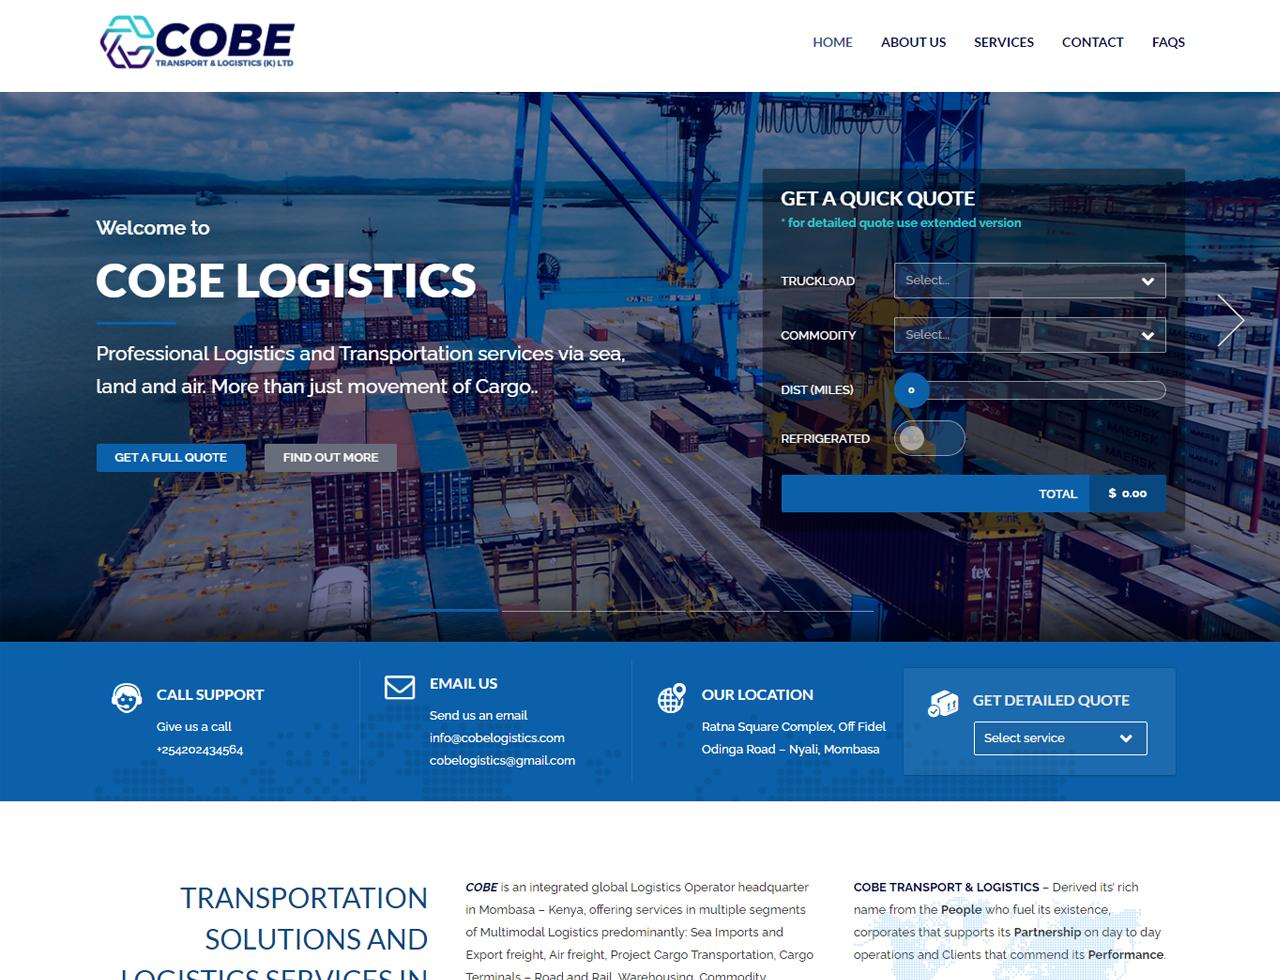 COBE Logistics Website Design by Inspimate Enterprises